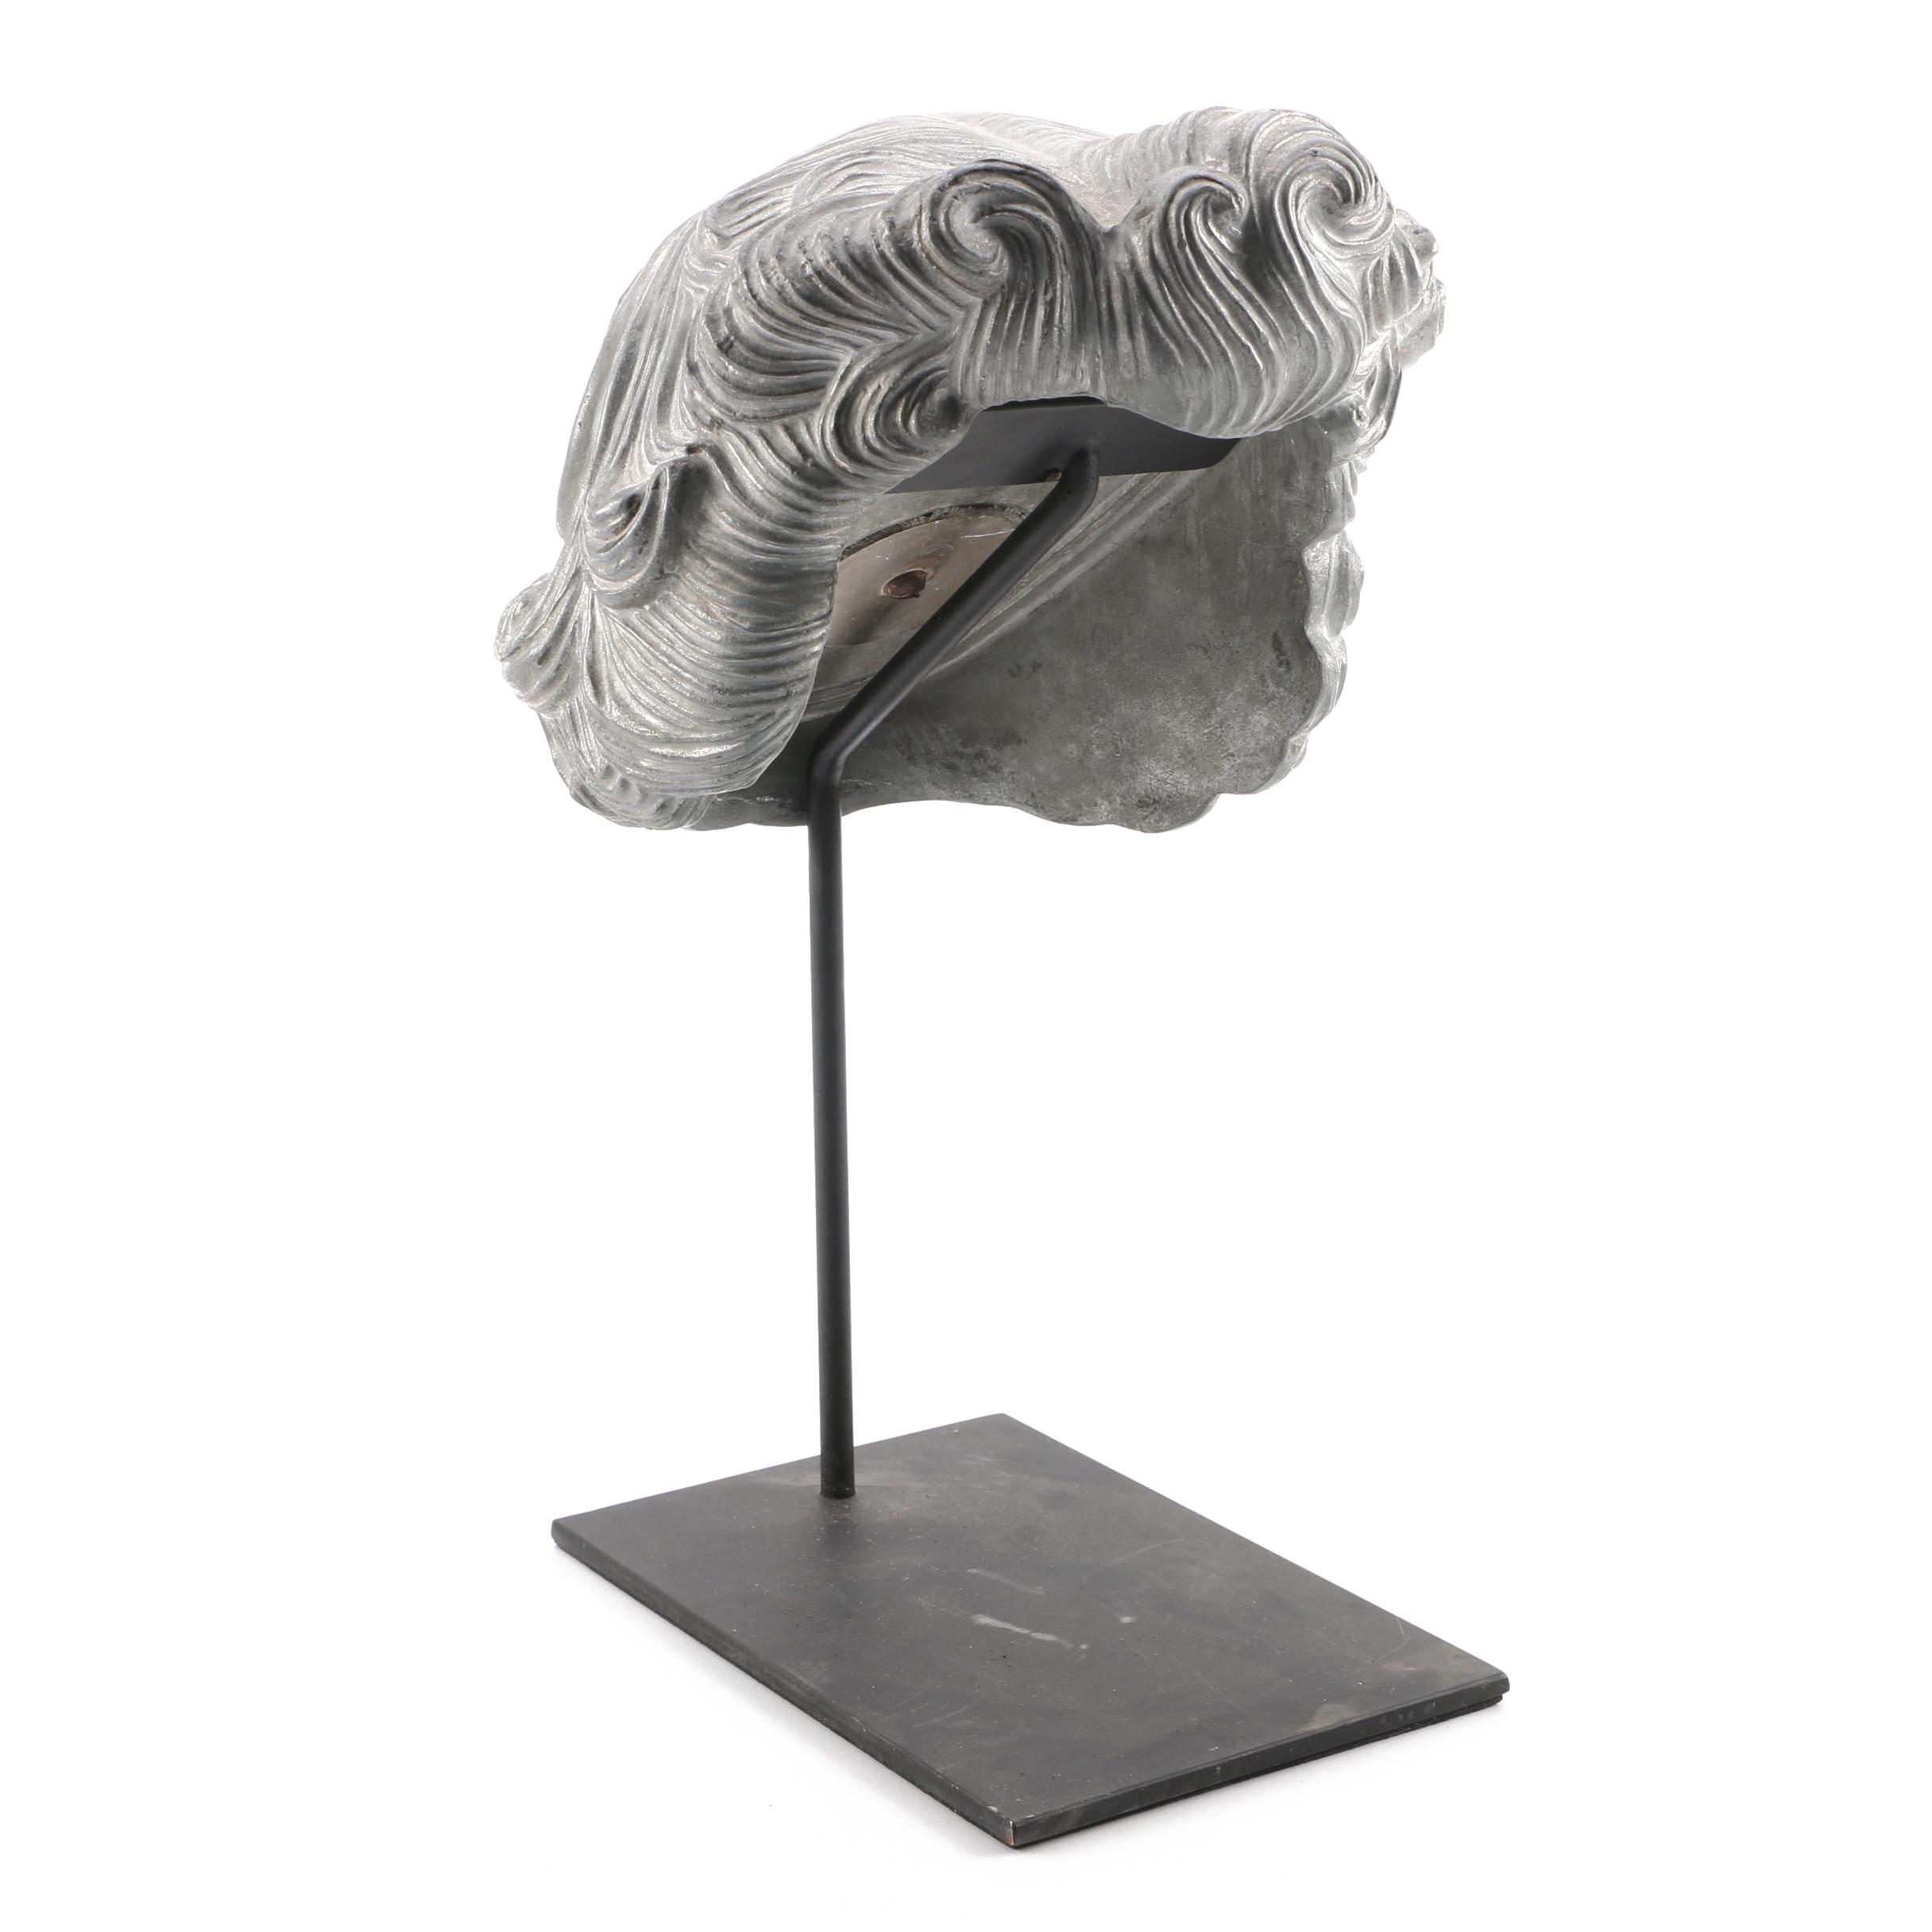 Metal Plaster Sculpture of Wig with 1940s Coiffure